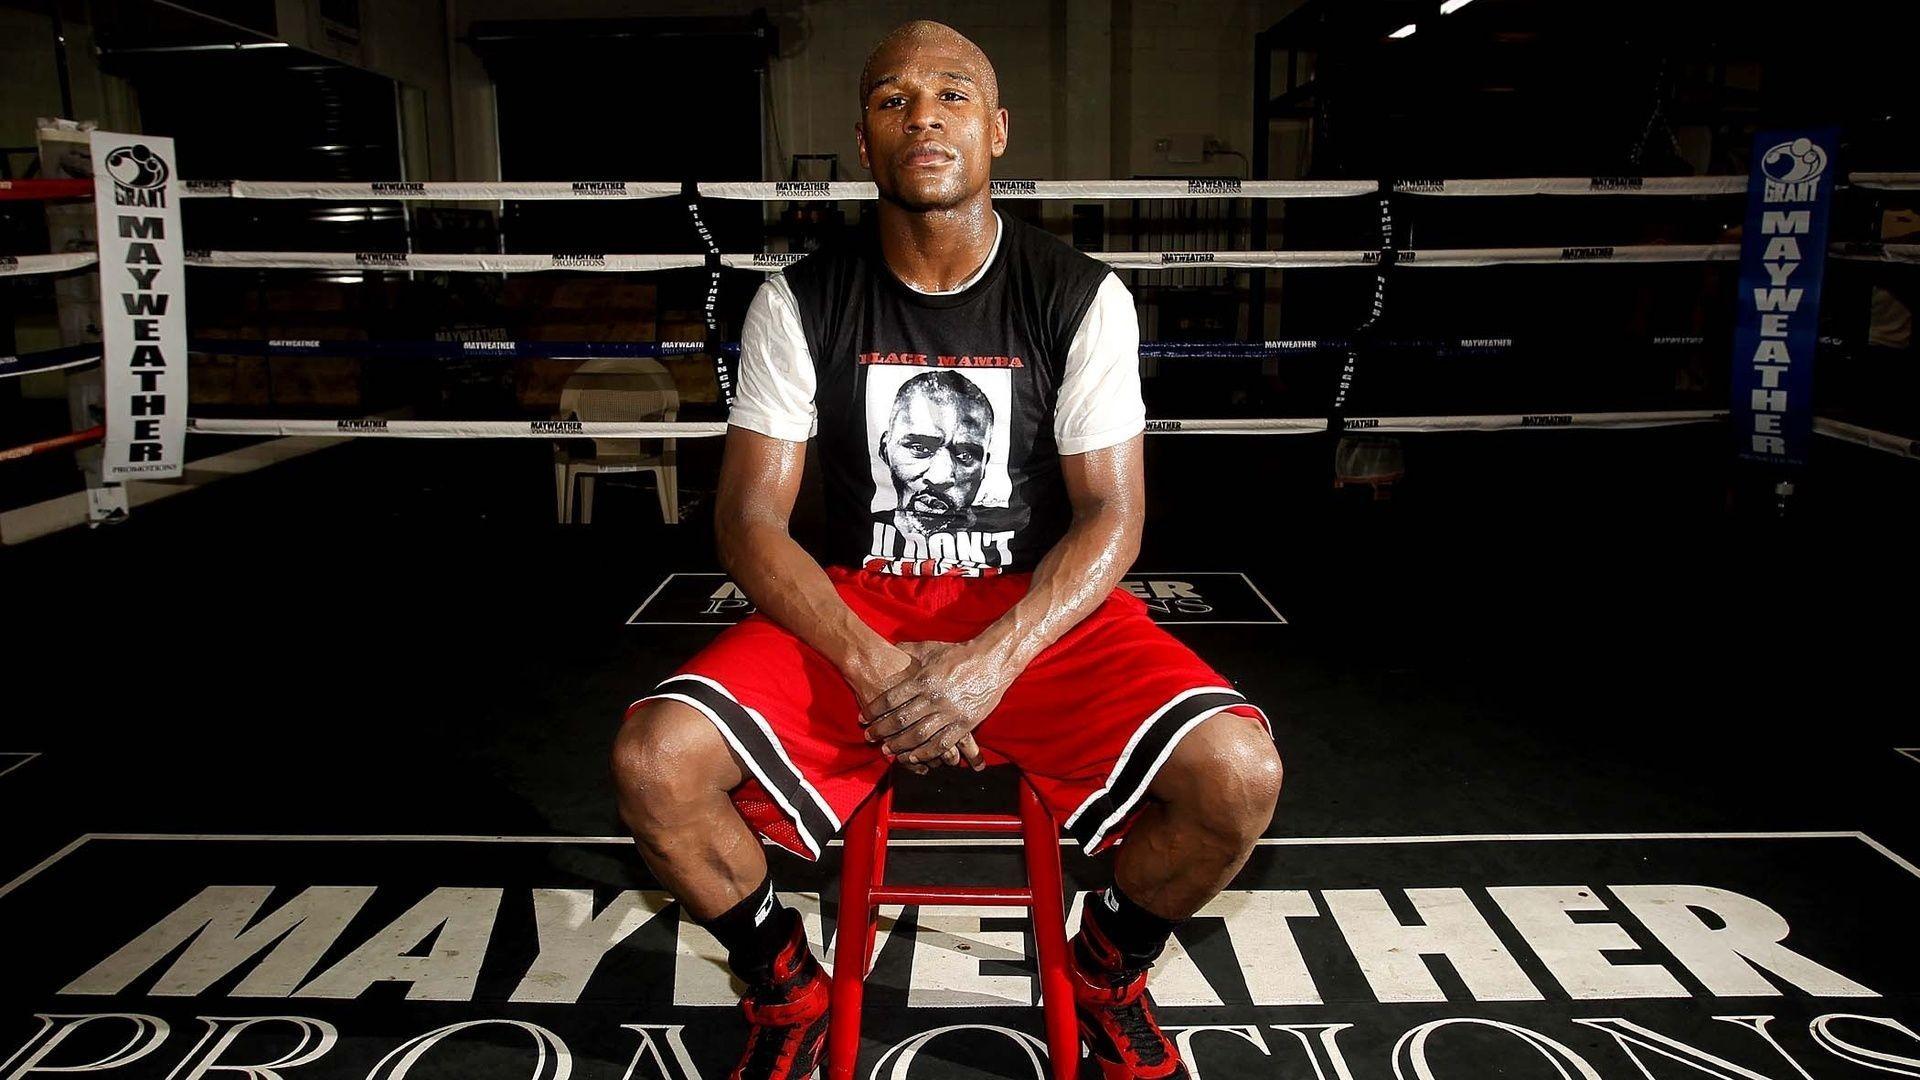 wbo, floyd mayweather, boxer, boxing, ring, floyd .